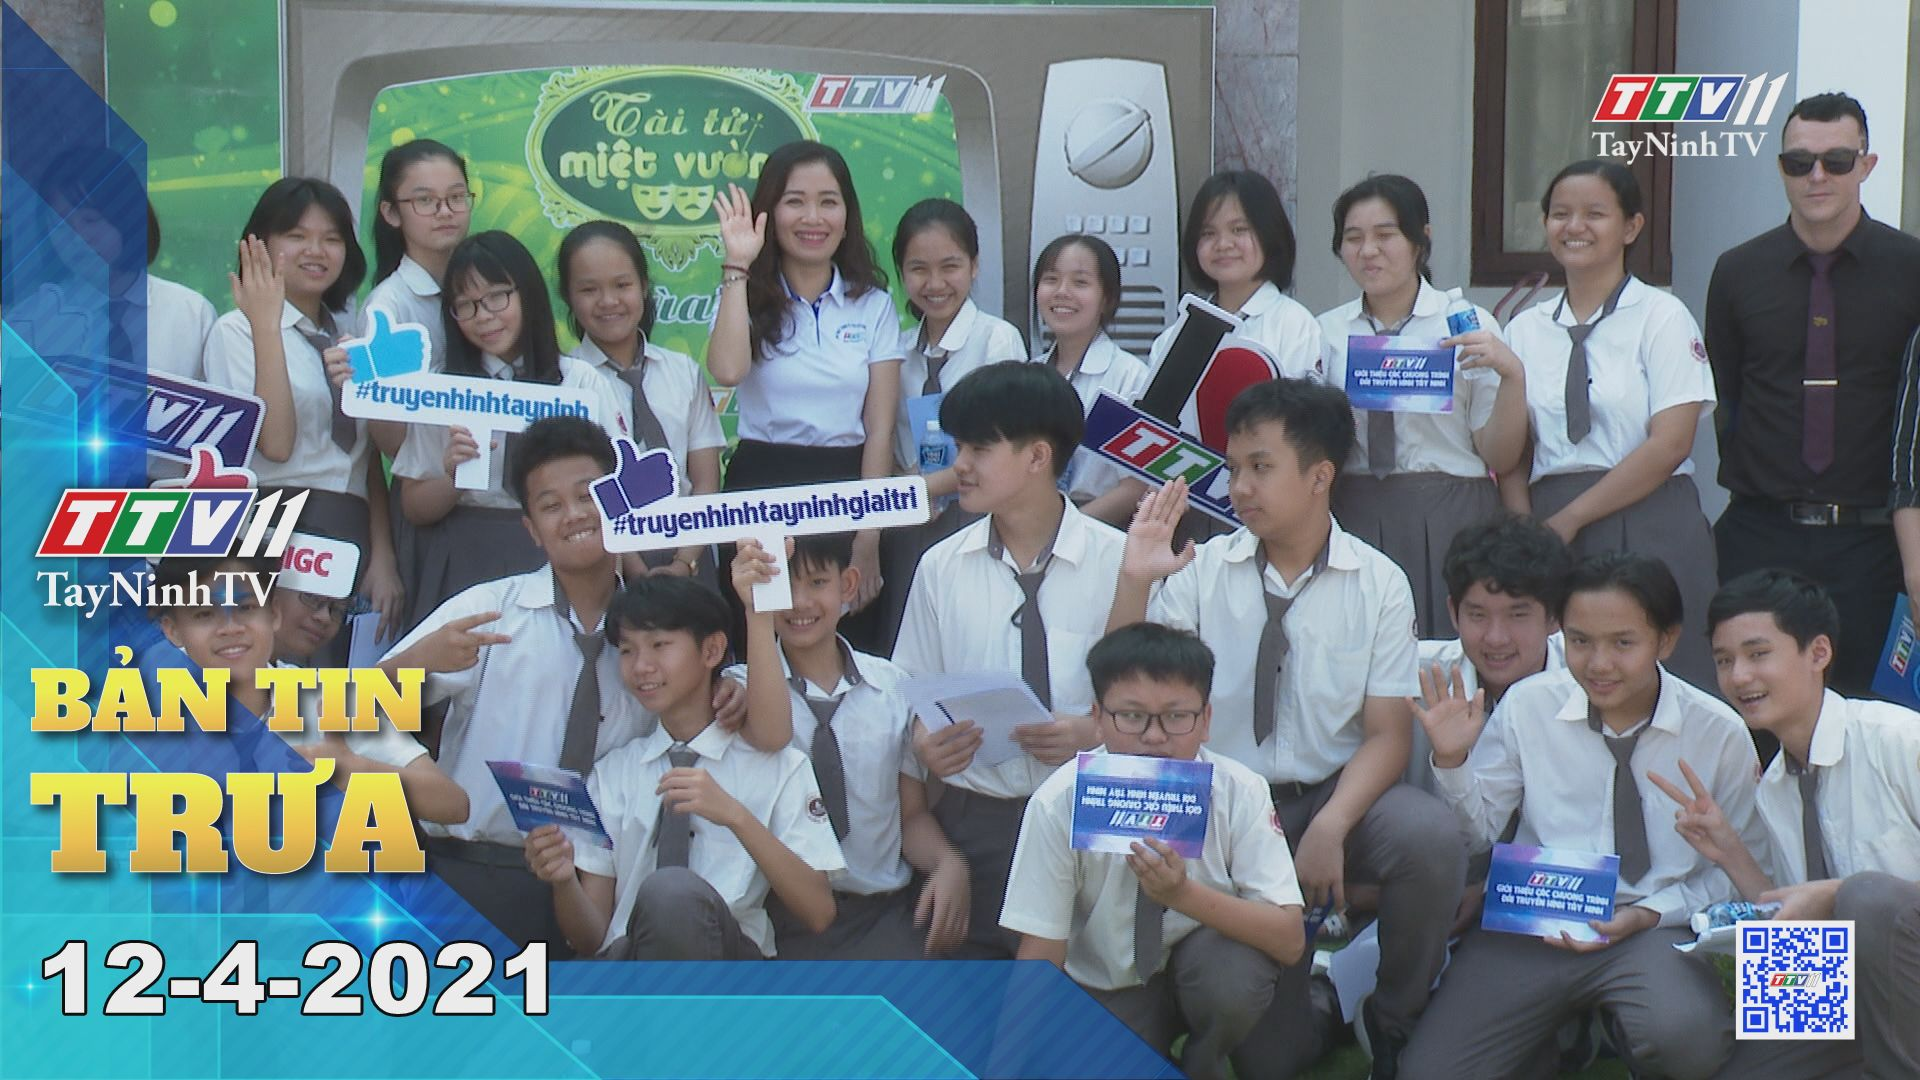 Bản tin trưa 12-4-2021 | Tin tức hôm nay | TayNinhTV